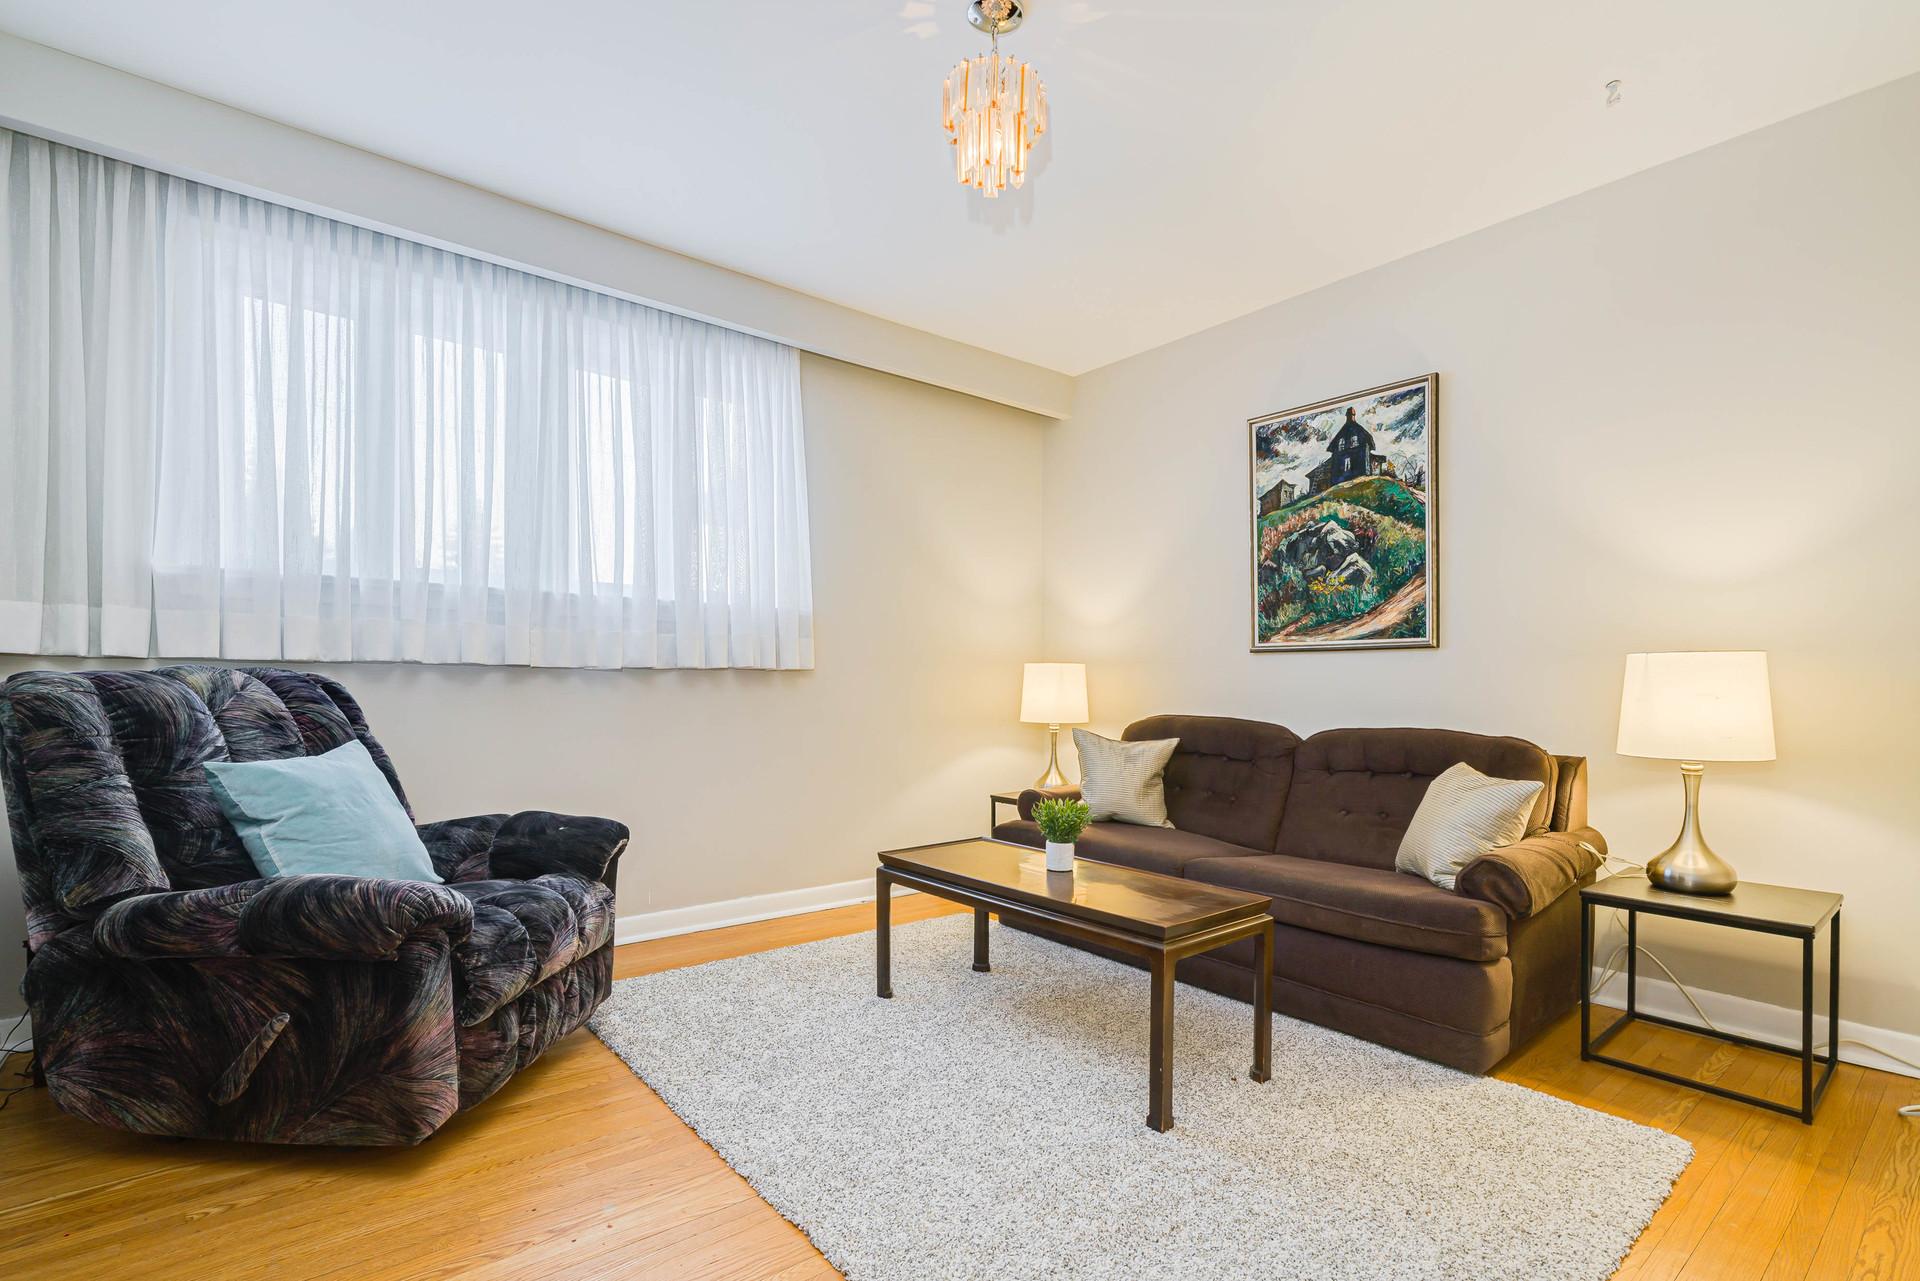 highres_025 at 38 Blithfield Avenue, Bayview Village, Toronto